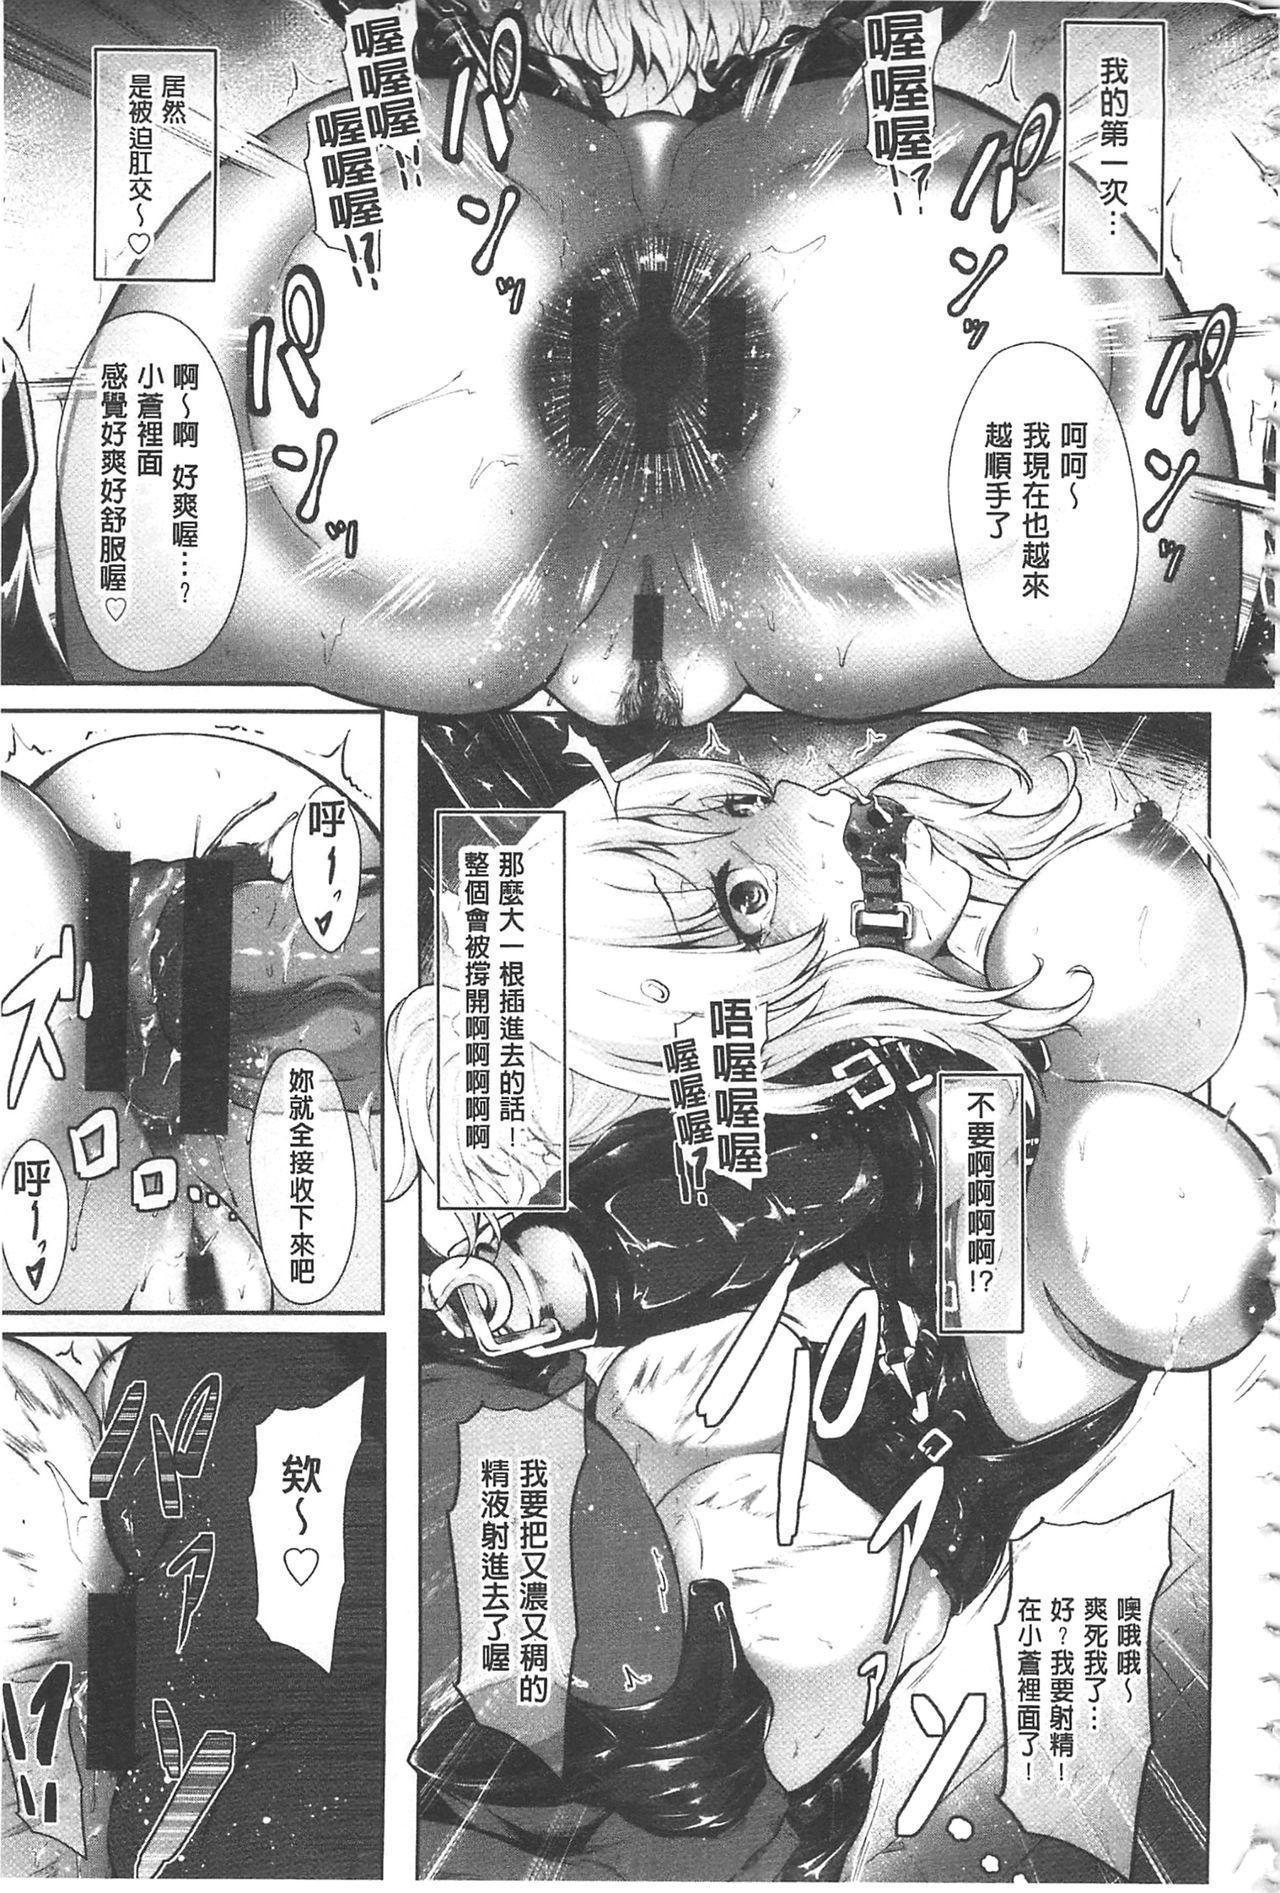 [Lorica] Biinkan Anal ~Kakusei Nejikomi Ana~ | 美淫感猥菊花 塞入擴張覺醒穴 [Chinese] 195